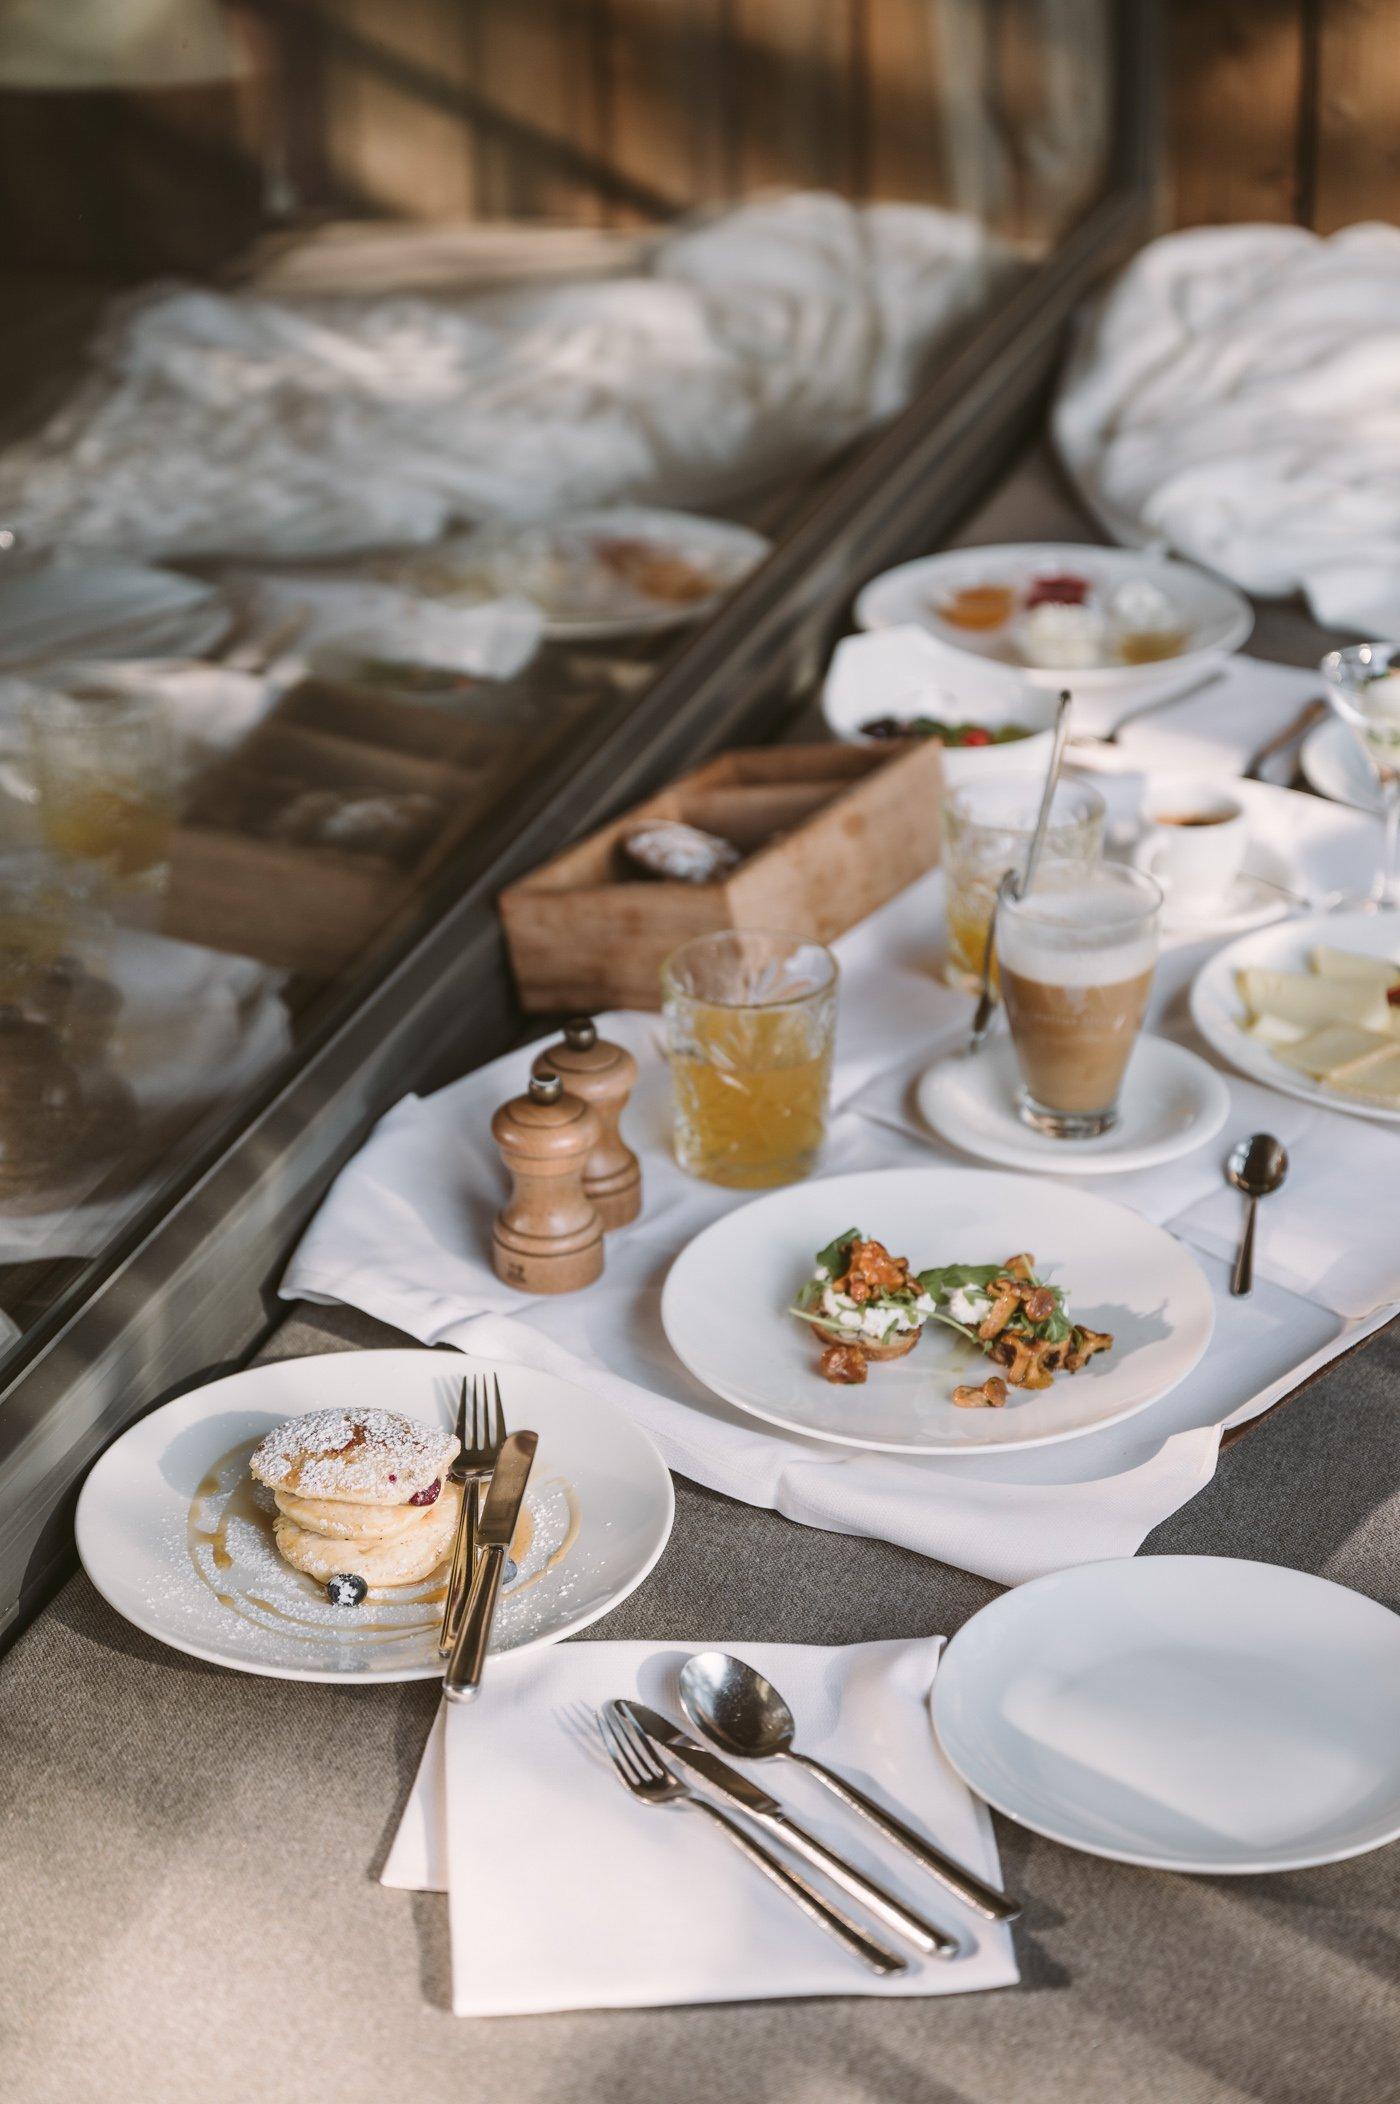 Room service breakfast at Hotel Saltus